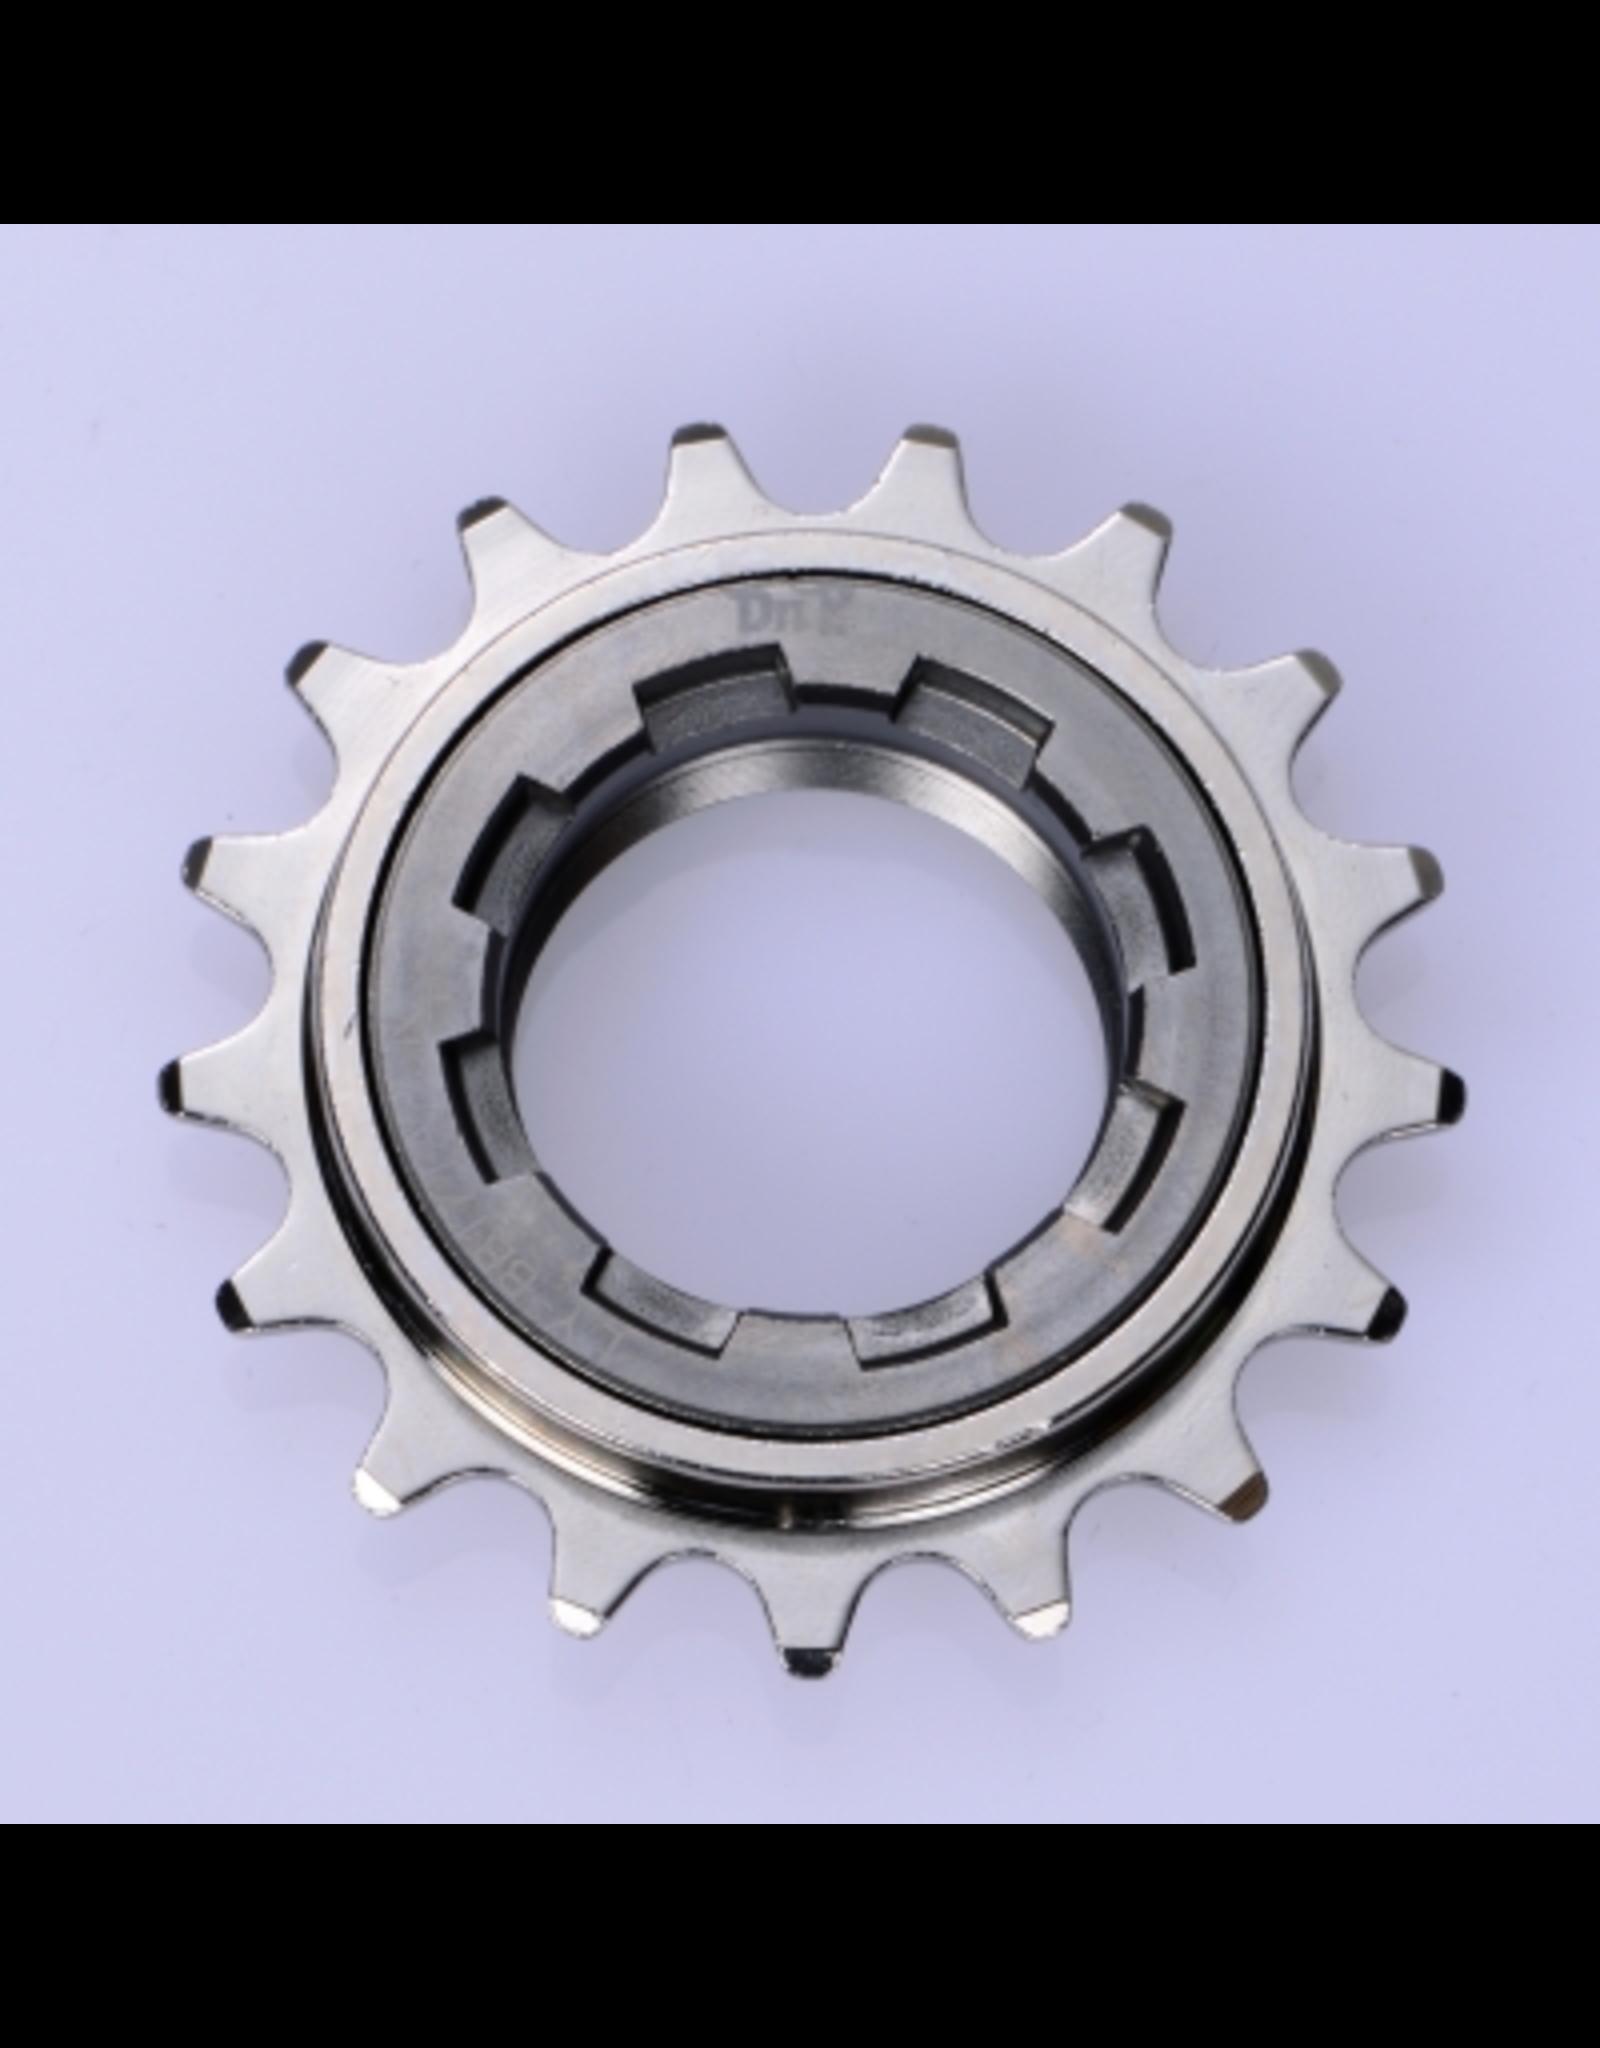 DNP Premium Single Speed Freewheel Chromoly